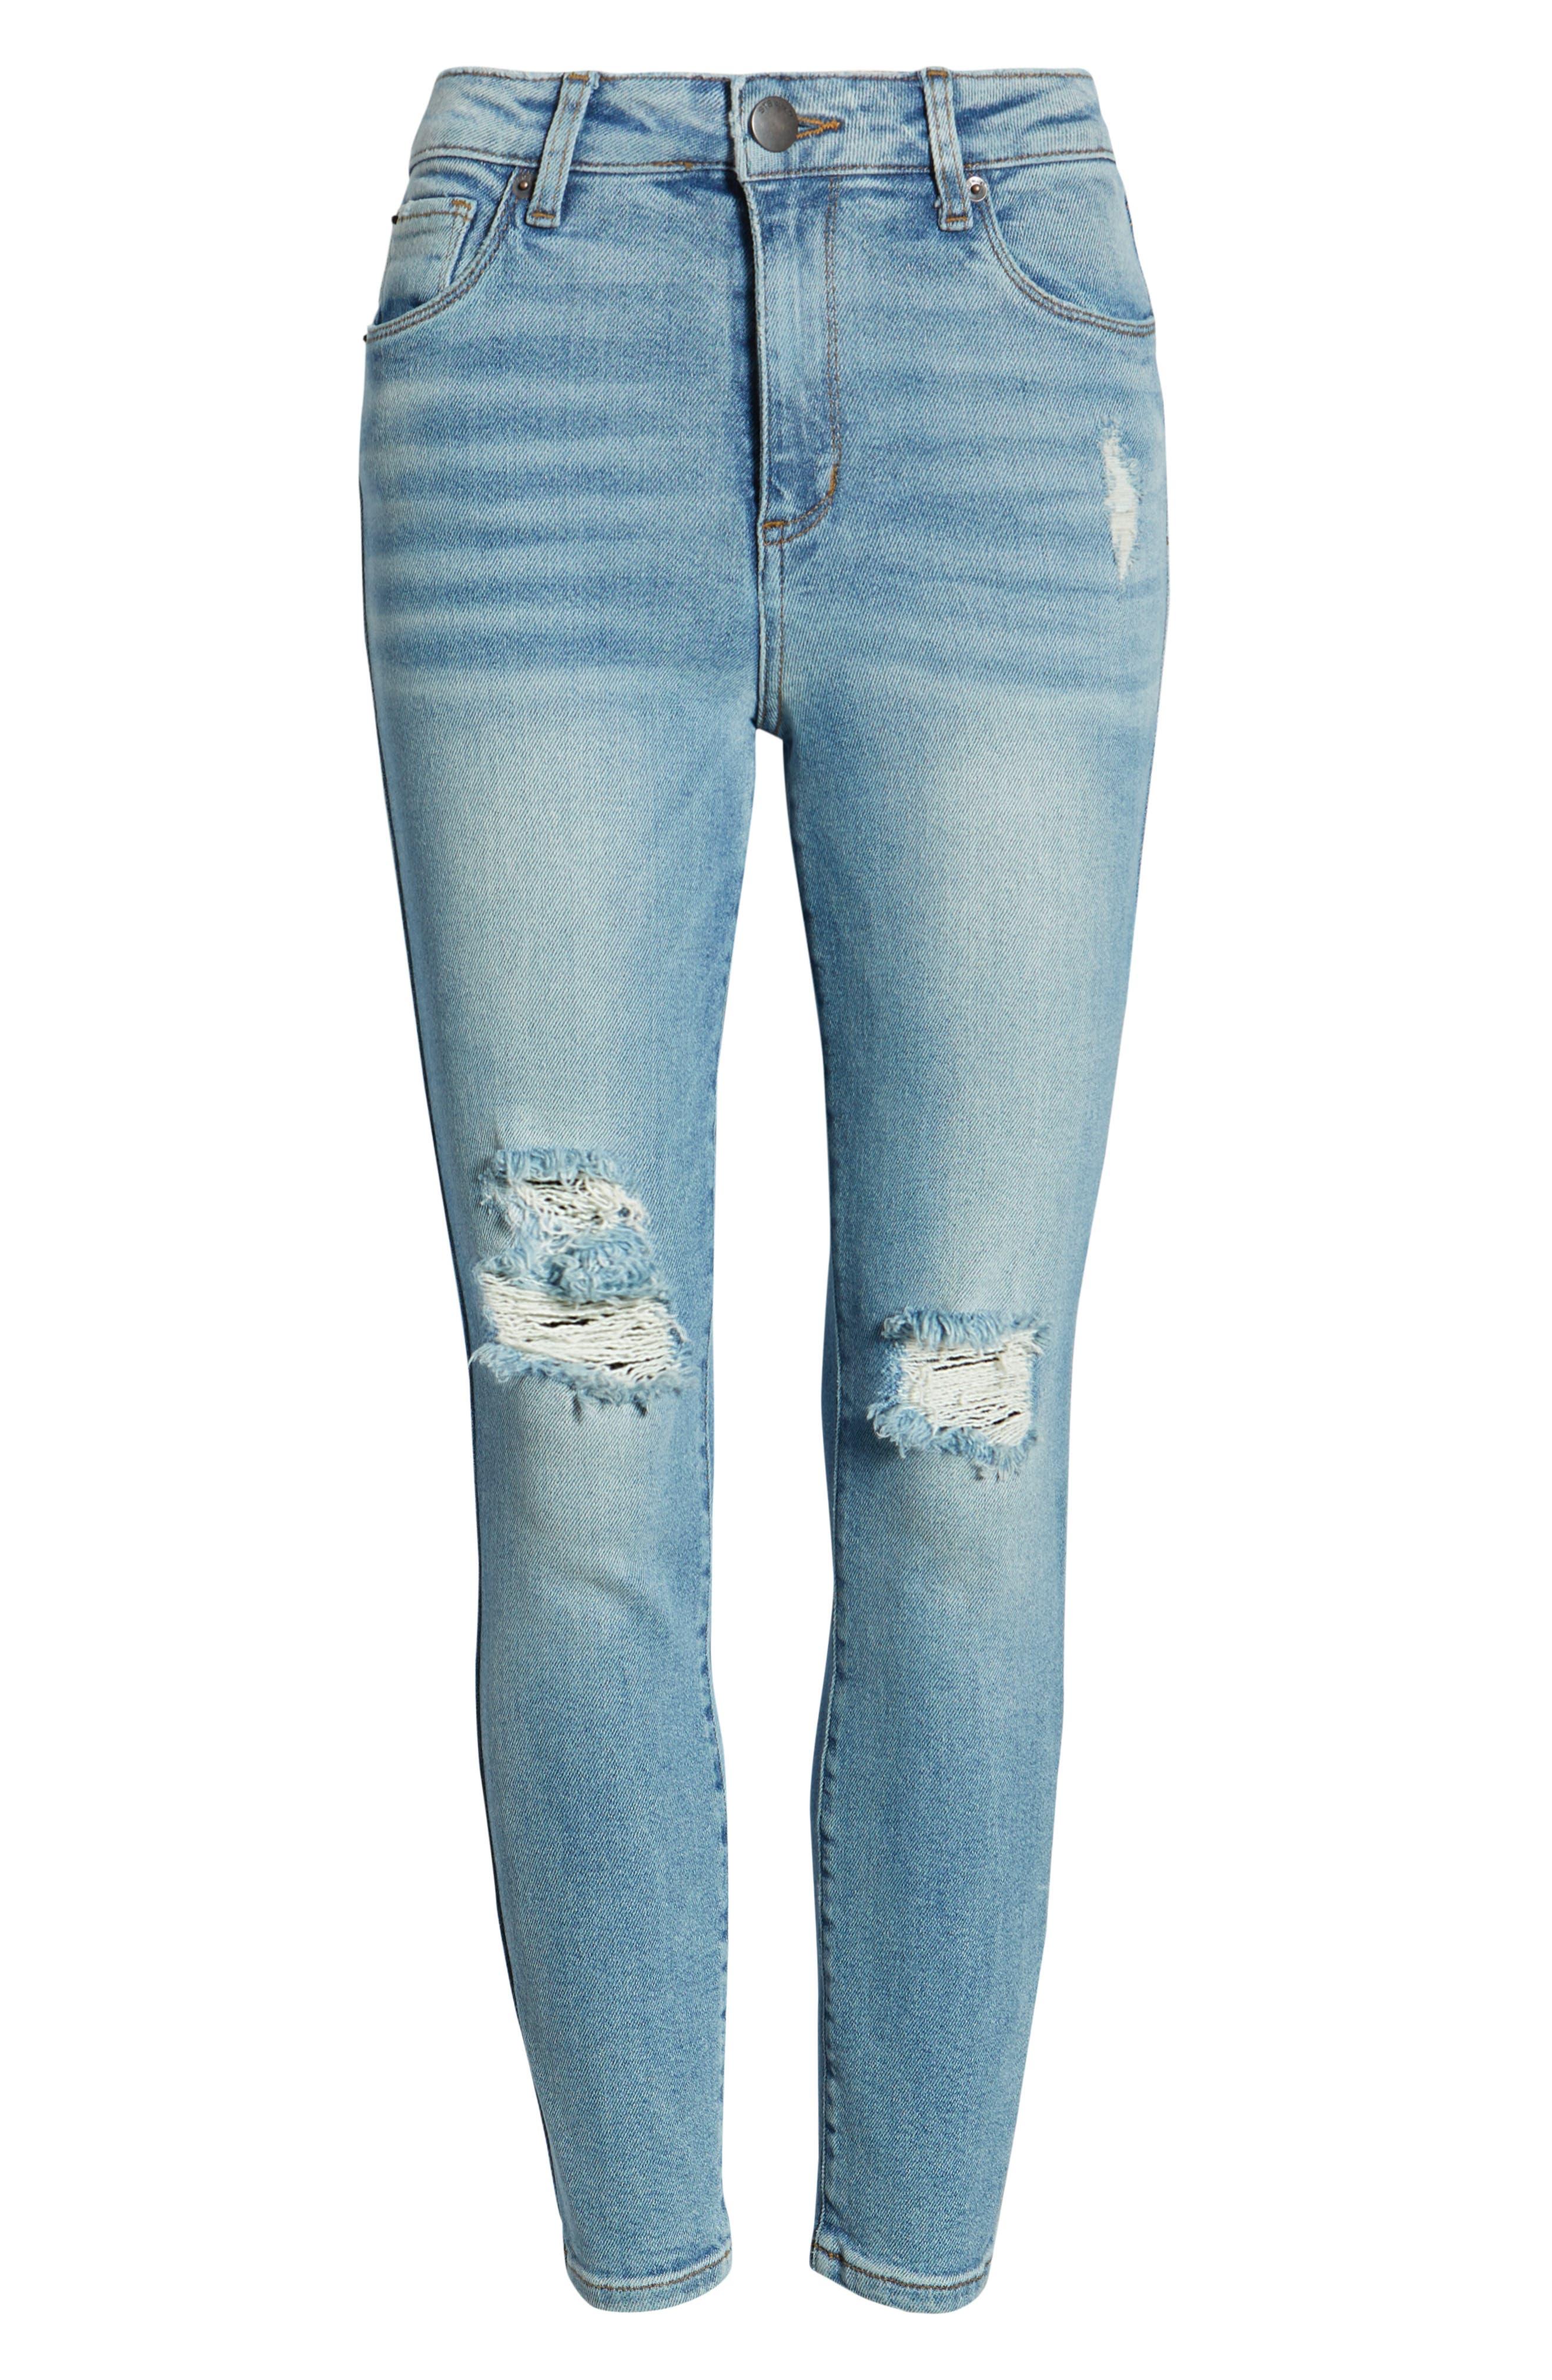 Brie High Waist Ripped Skinny Jeans,                             Alternate thumbnail 7, color,                             BRADFORD LIGHT WASH